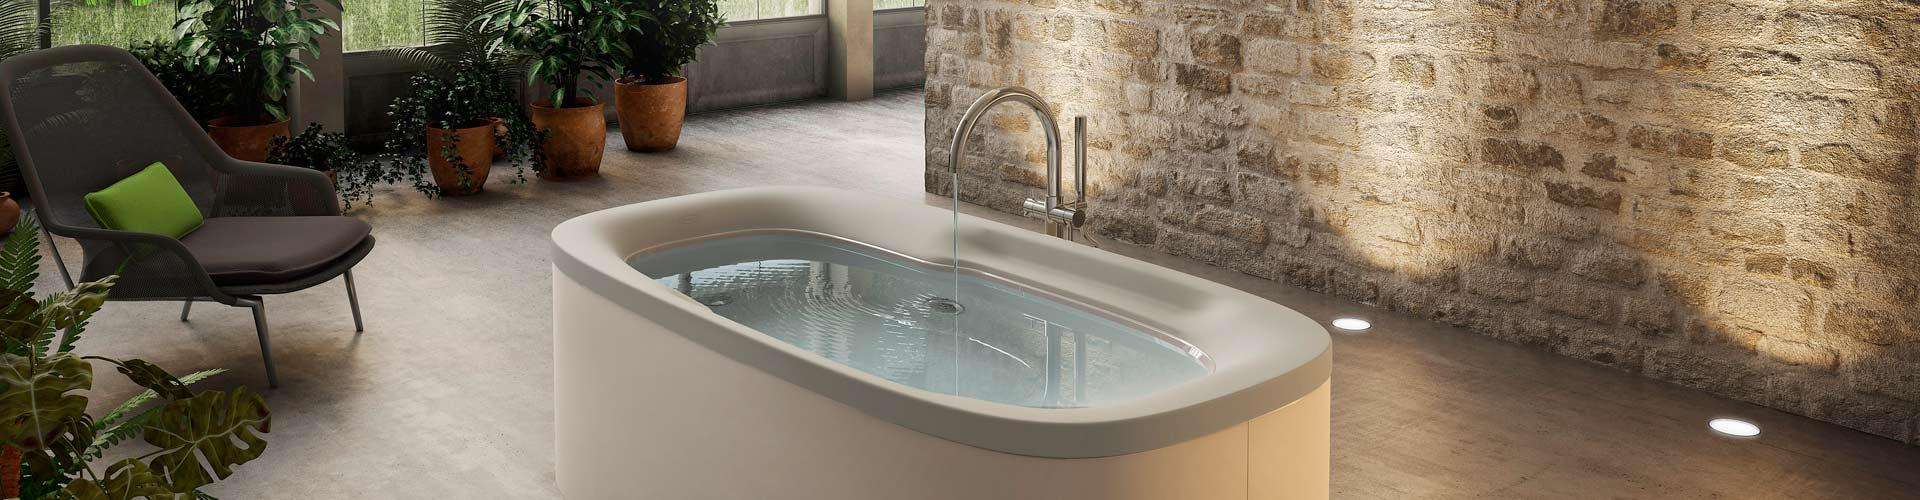 Vasche da bagno jacuzzi carboni casa for Vasche da bagno jacuzzi